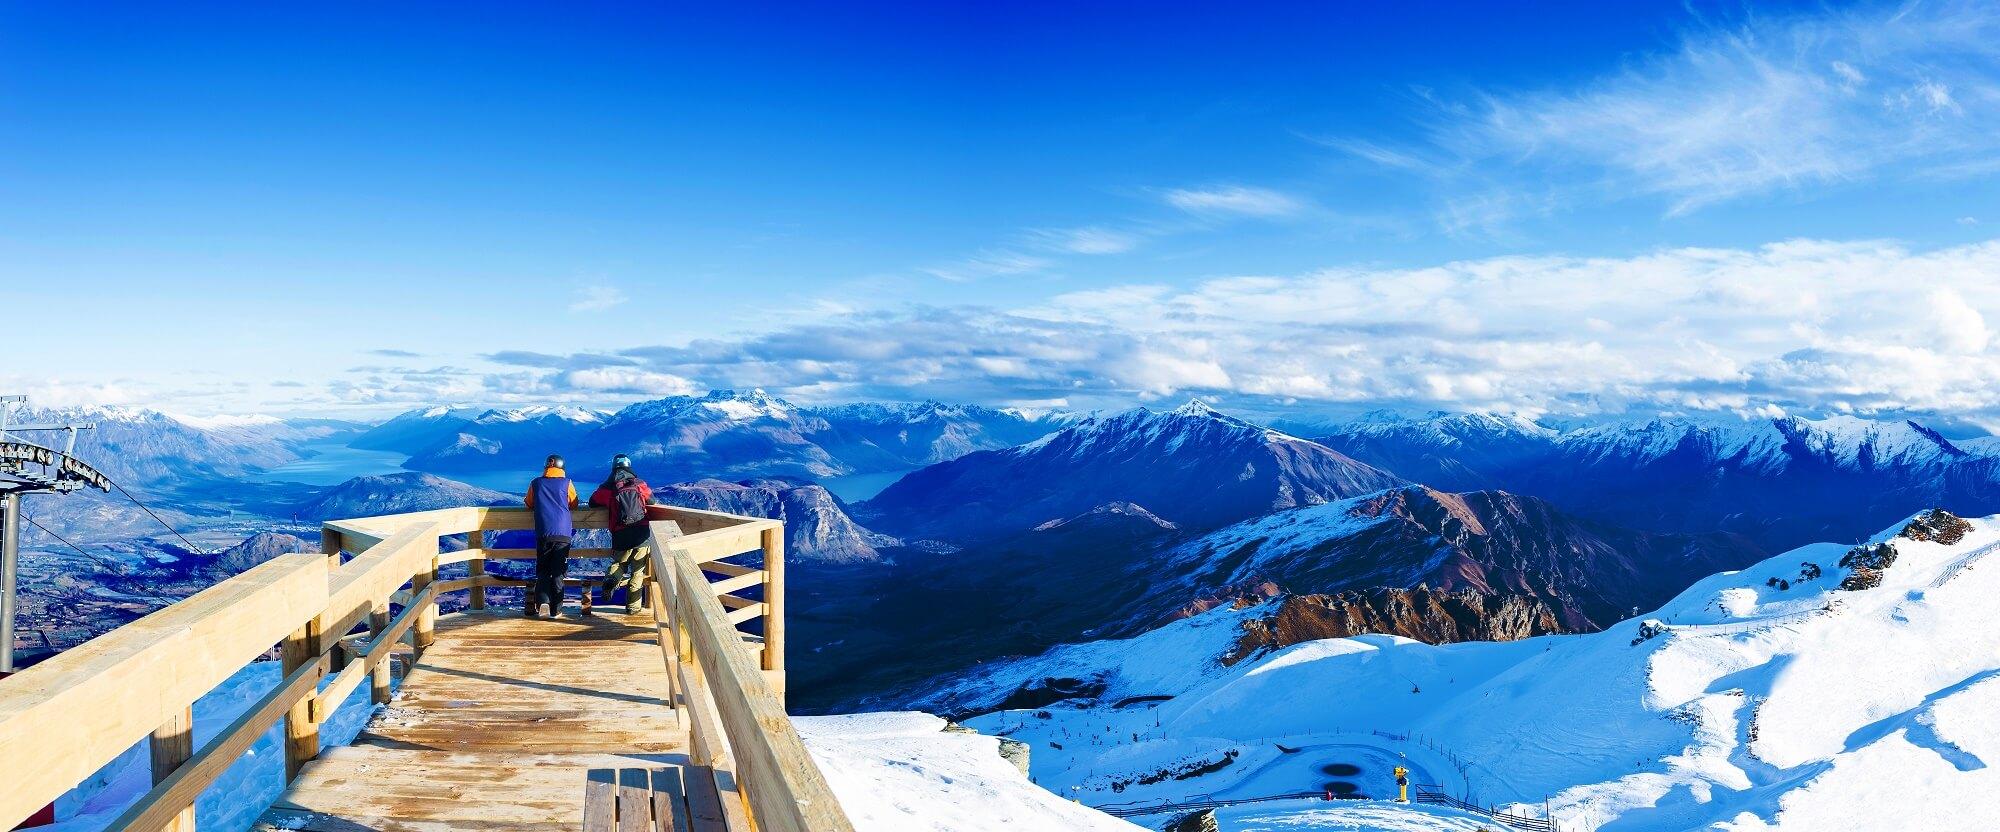 CoronetPeak Spectacular View.jpg